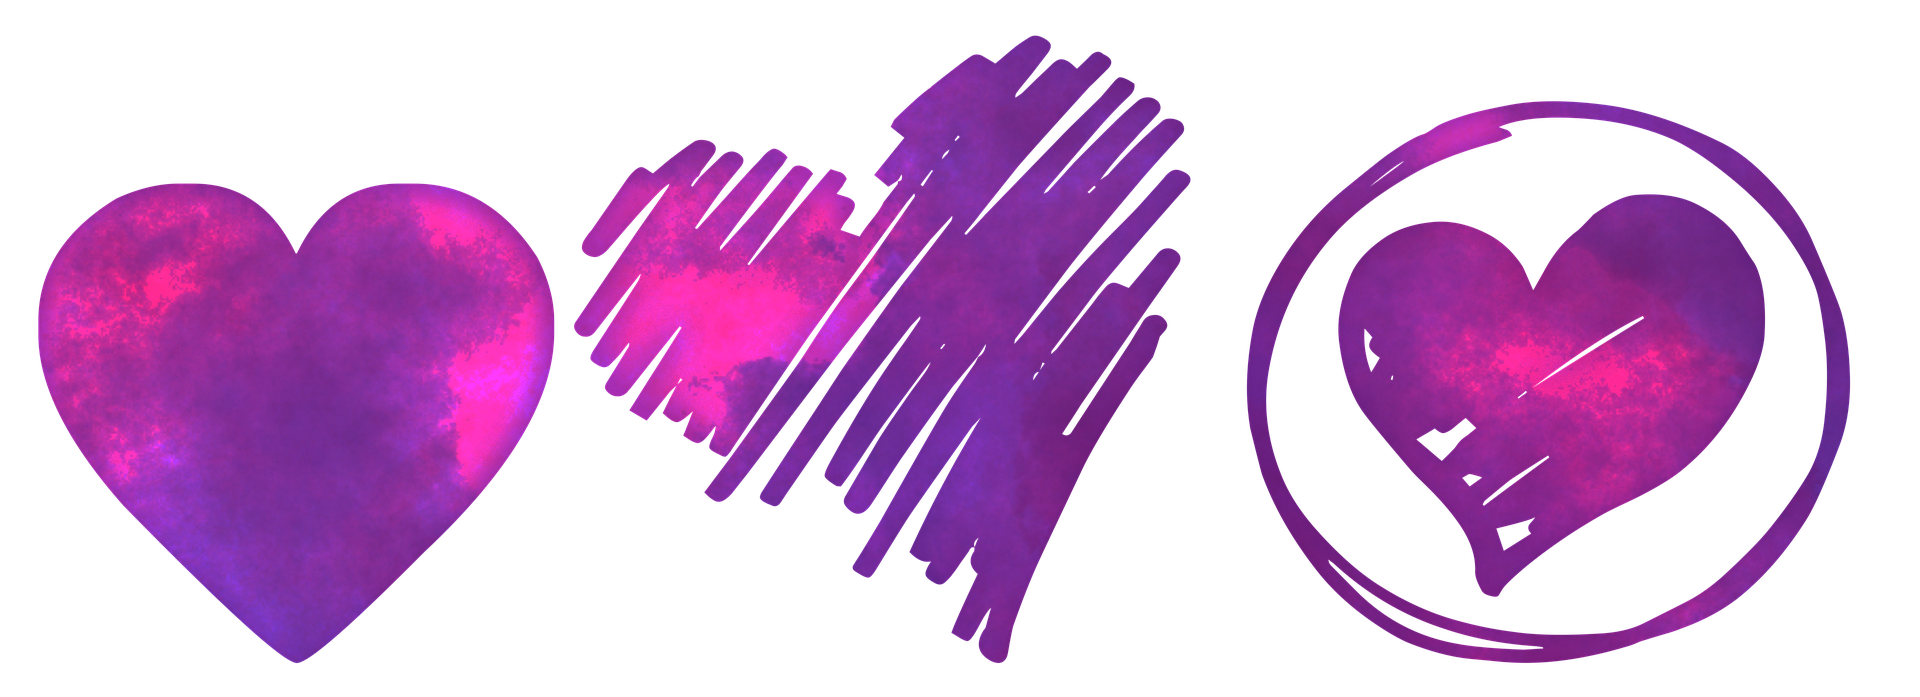 Flavie Dode énergie douce 3 coeurs amour rose bleu violet